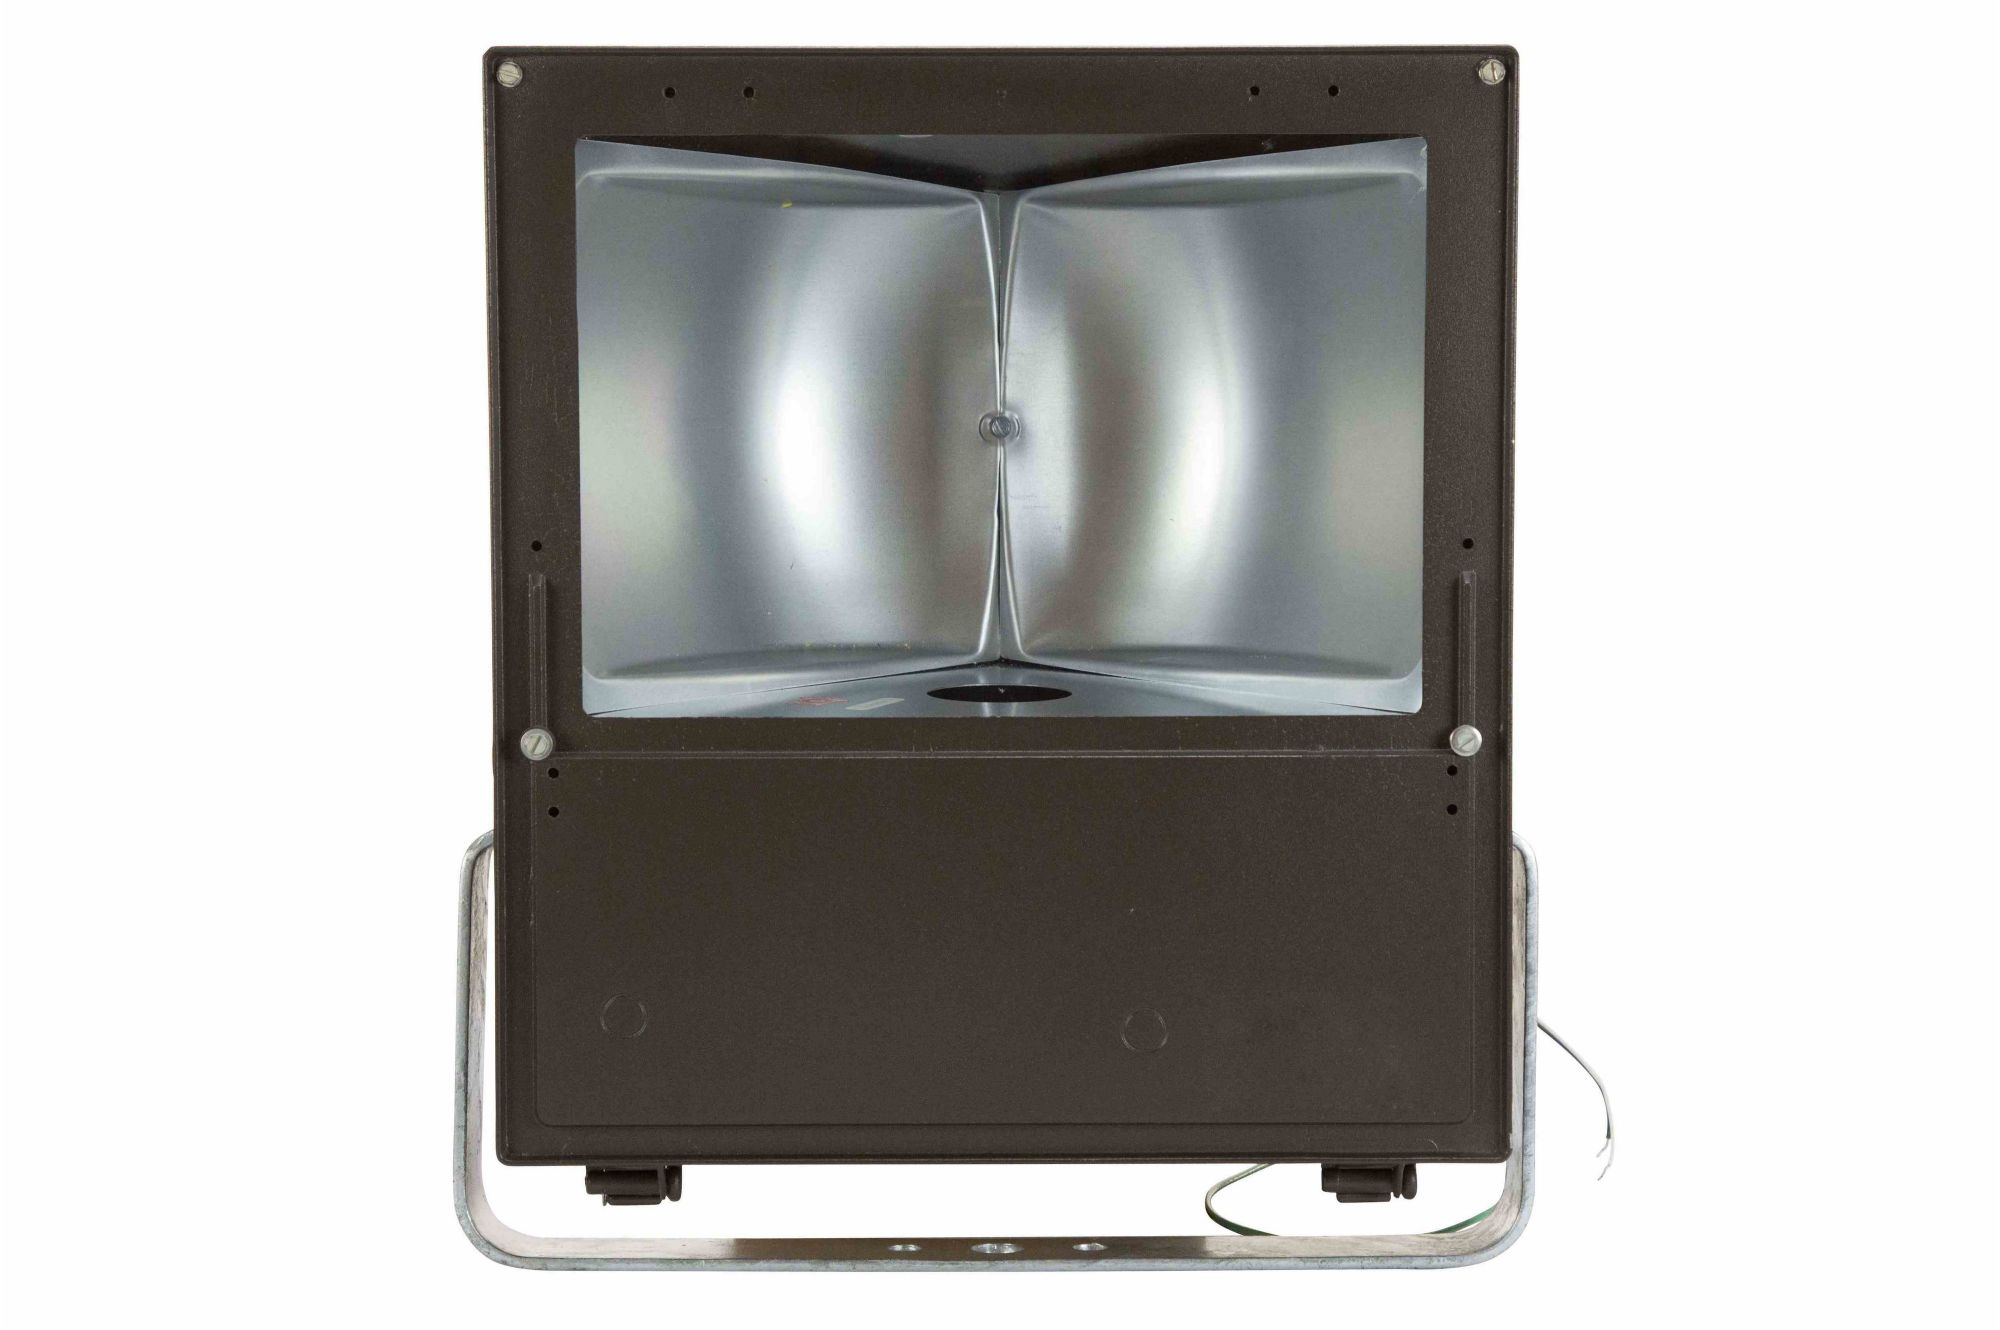 hight resolution of hi res image 2 1000 watt metal halide light front